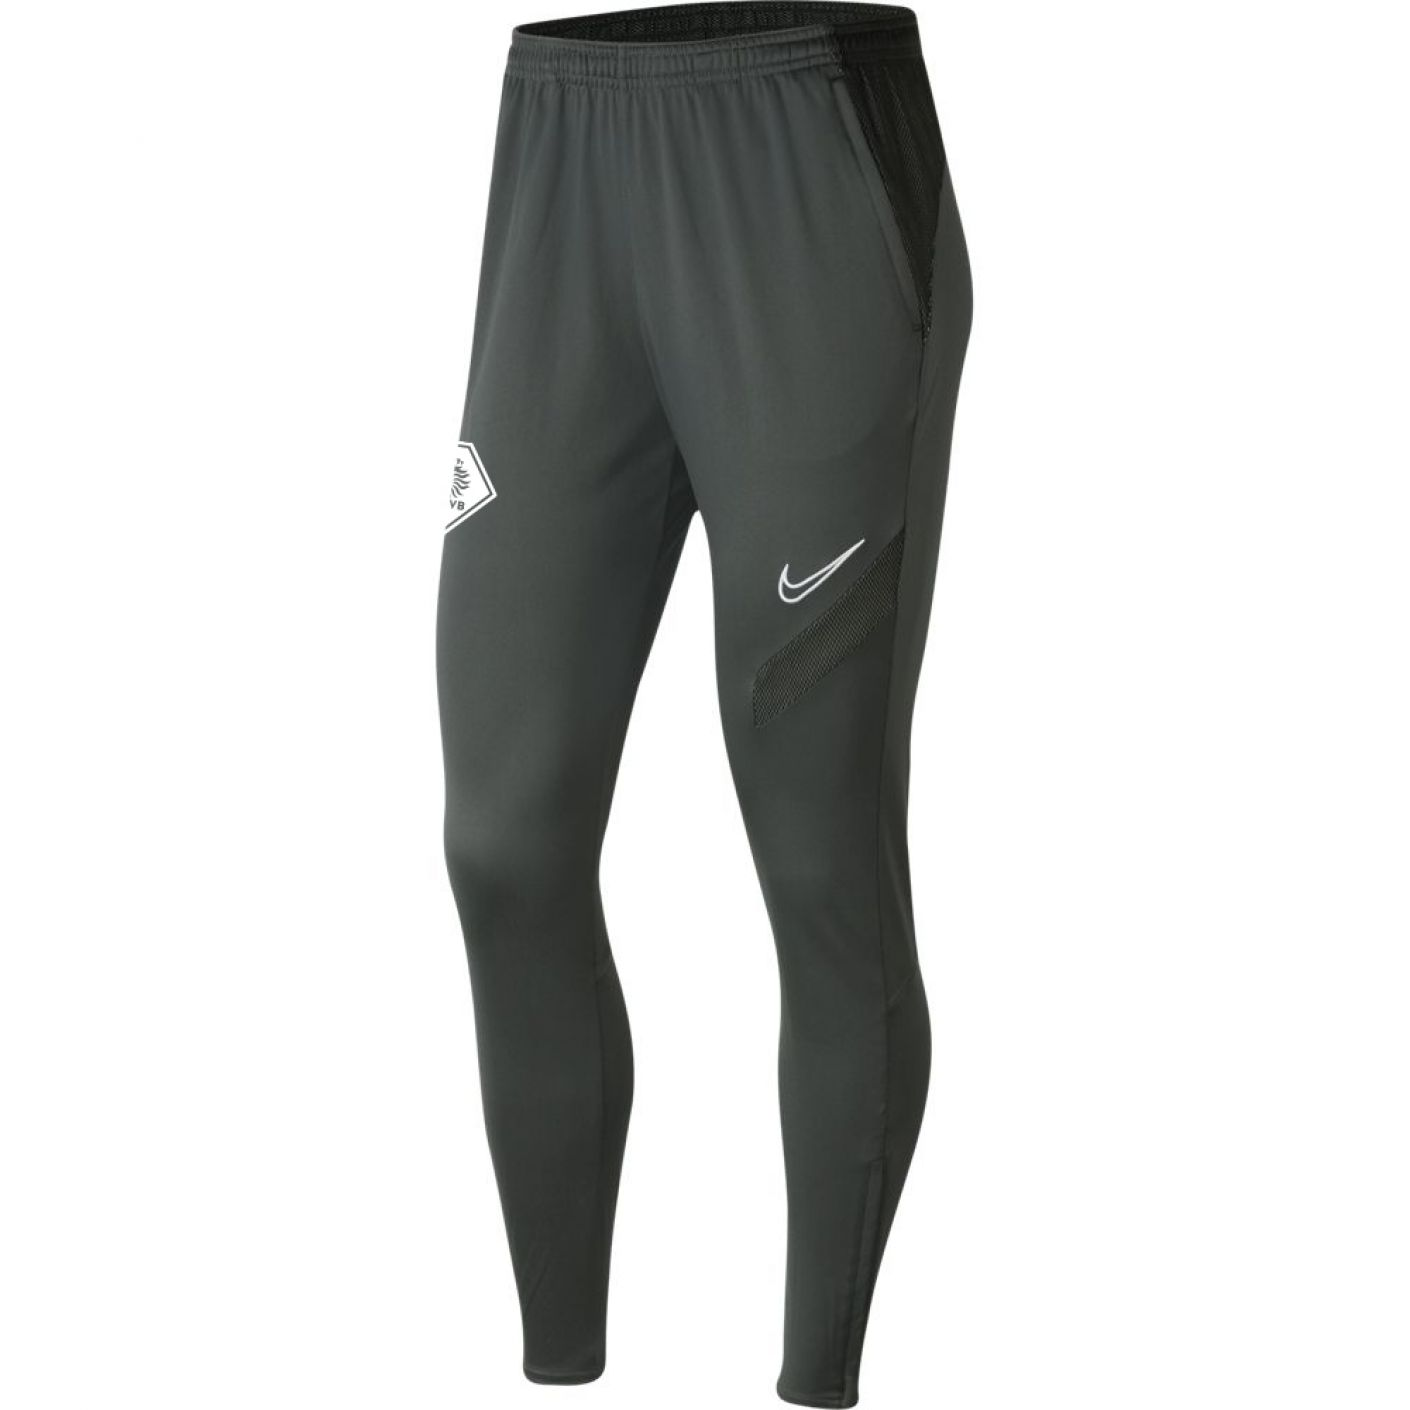 Nike KNVB Academy Pro Trainingsbroek Vrouwen Antraciet Zwart